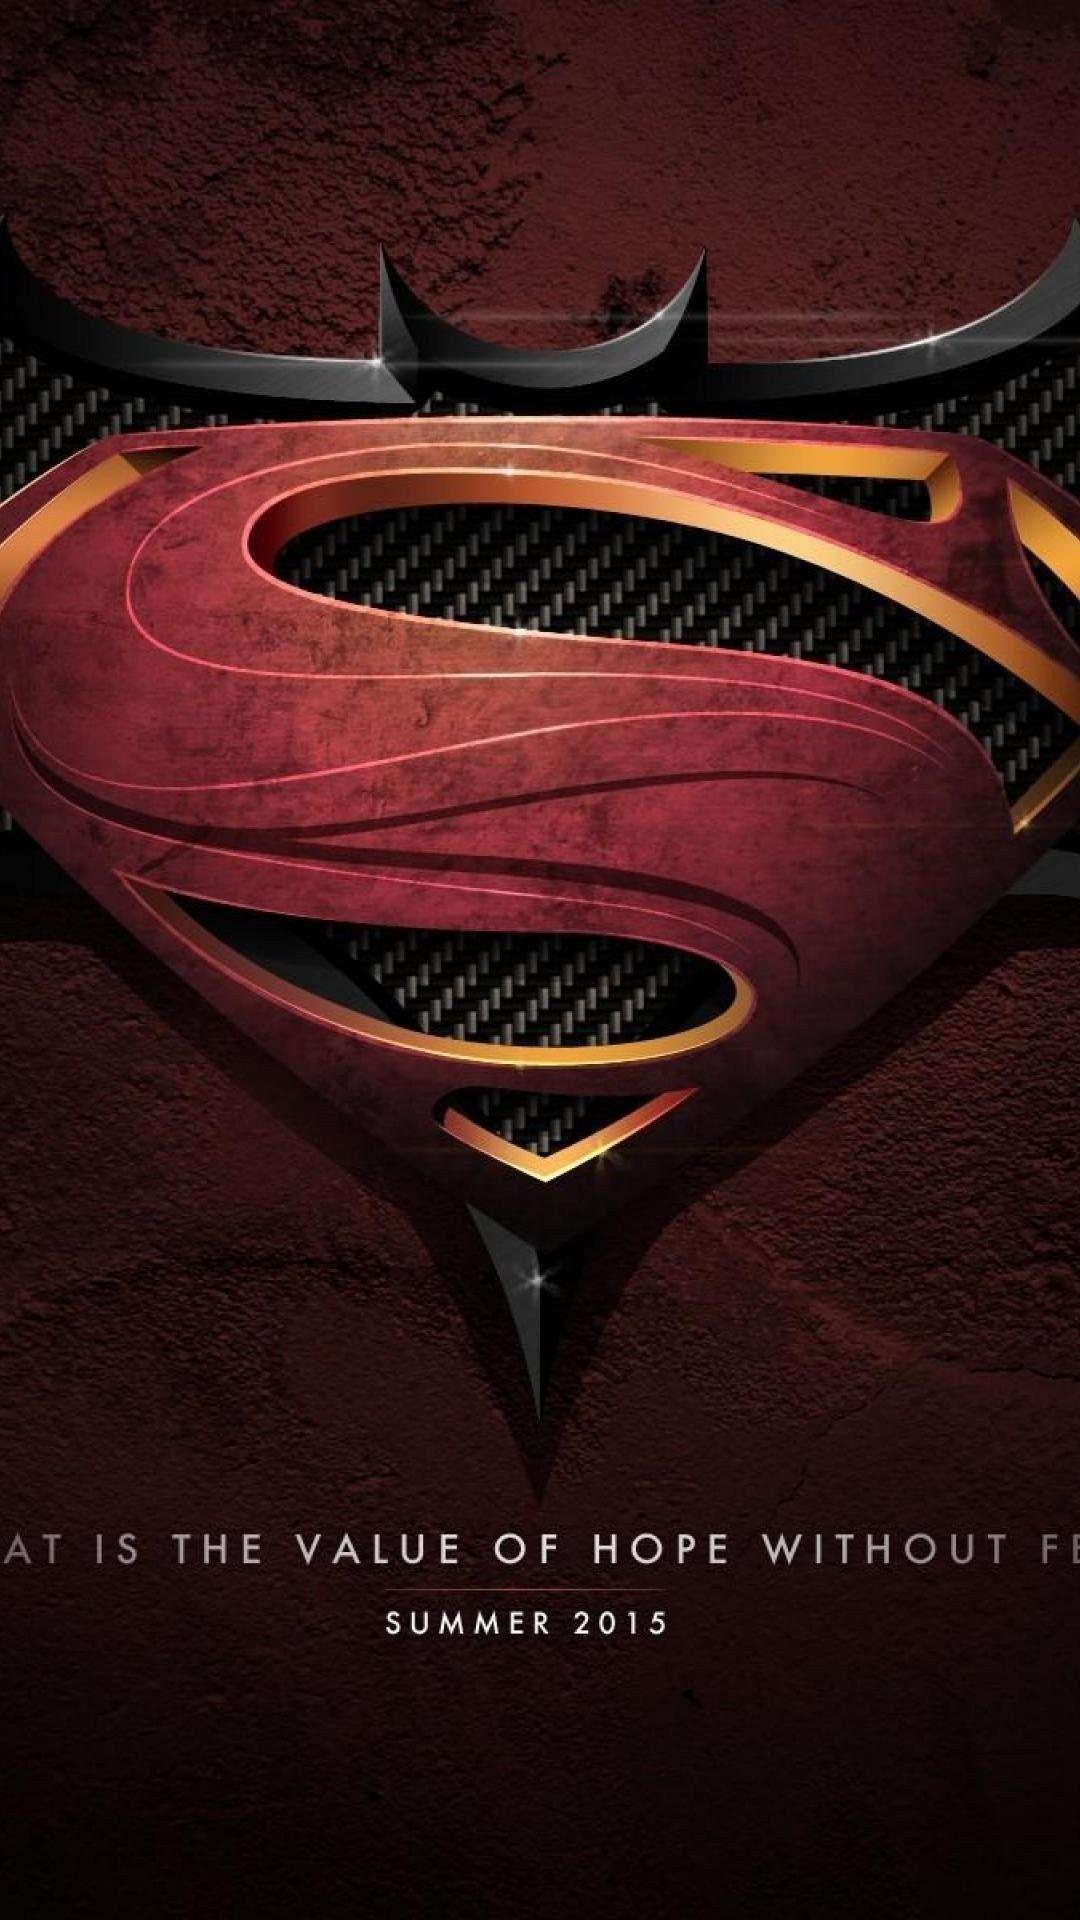 Batman Vs Superman Samsung Wallpapers Note 8 2020 Live Wallpaper Hd Batman Vs Superman Marvel And Dc Superheroes Batman Vs Superman Movie